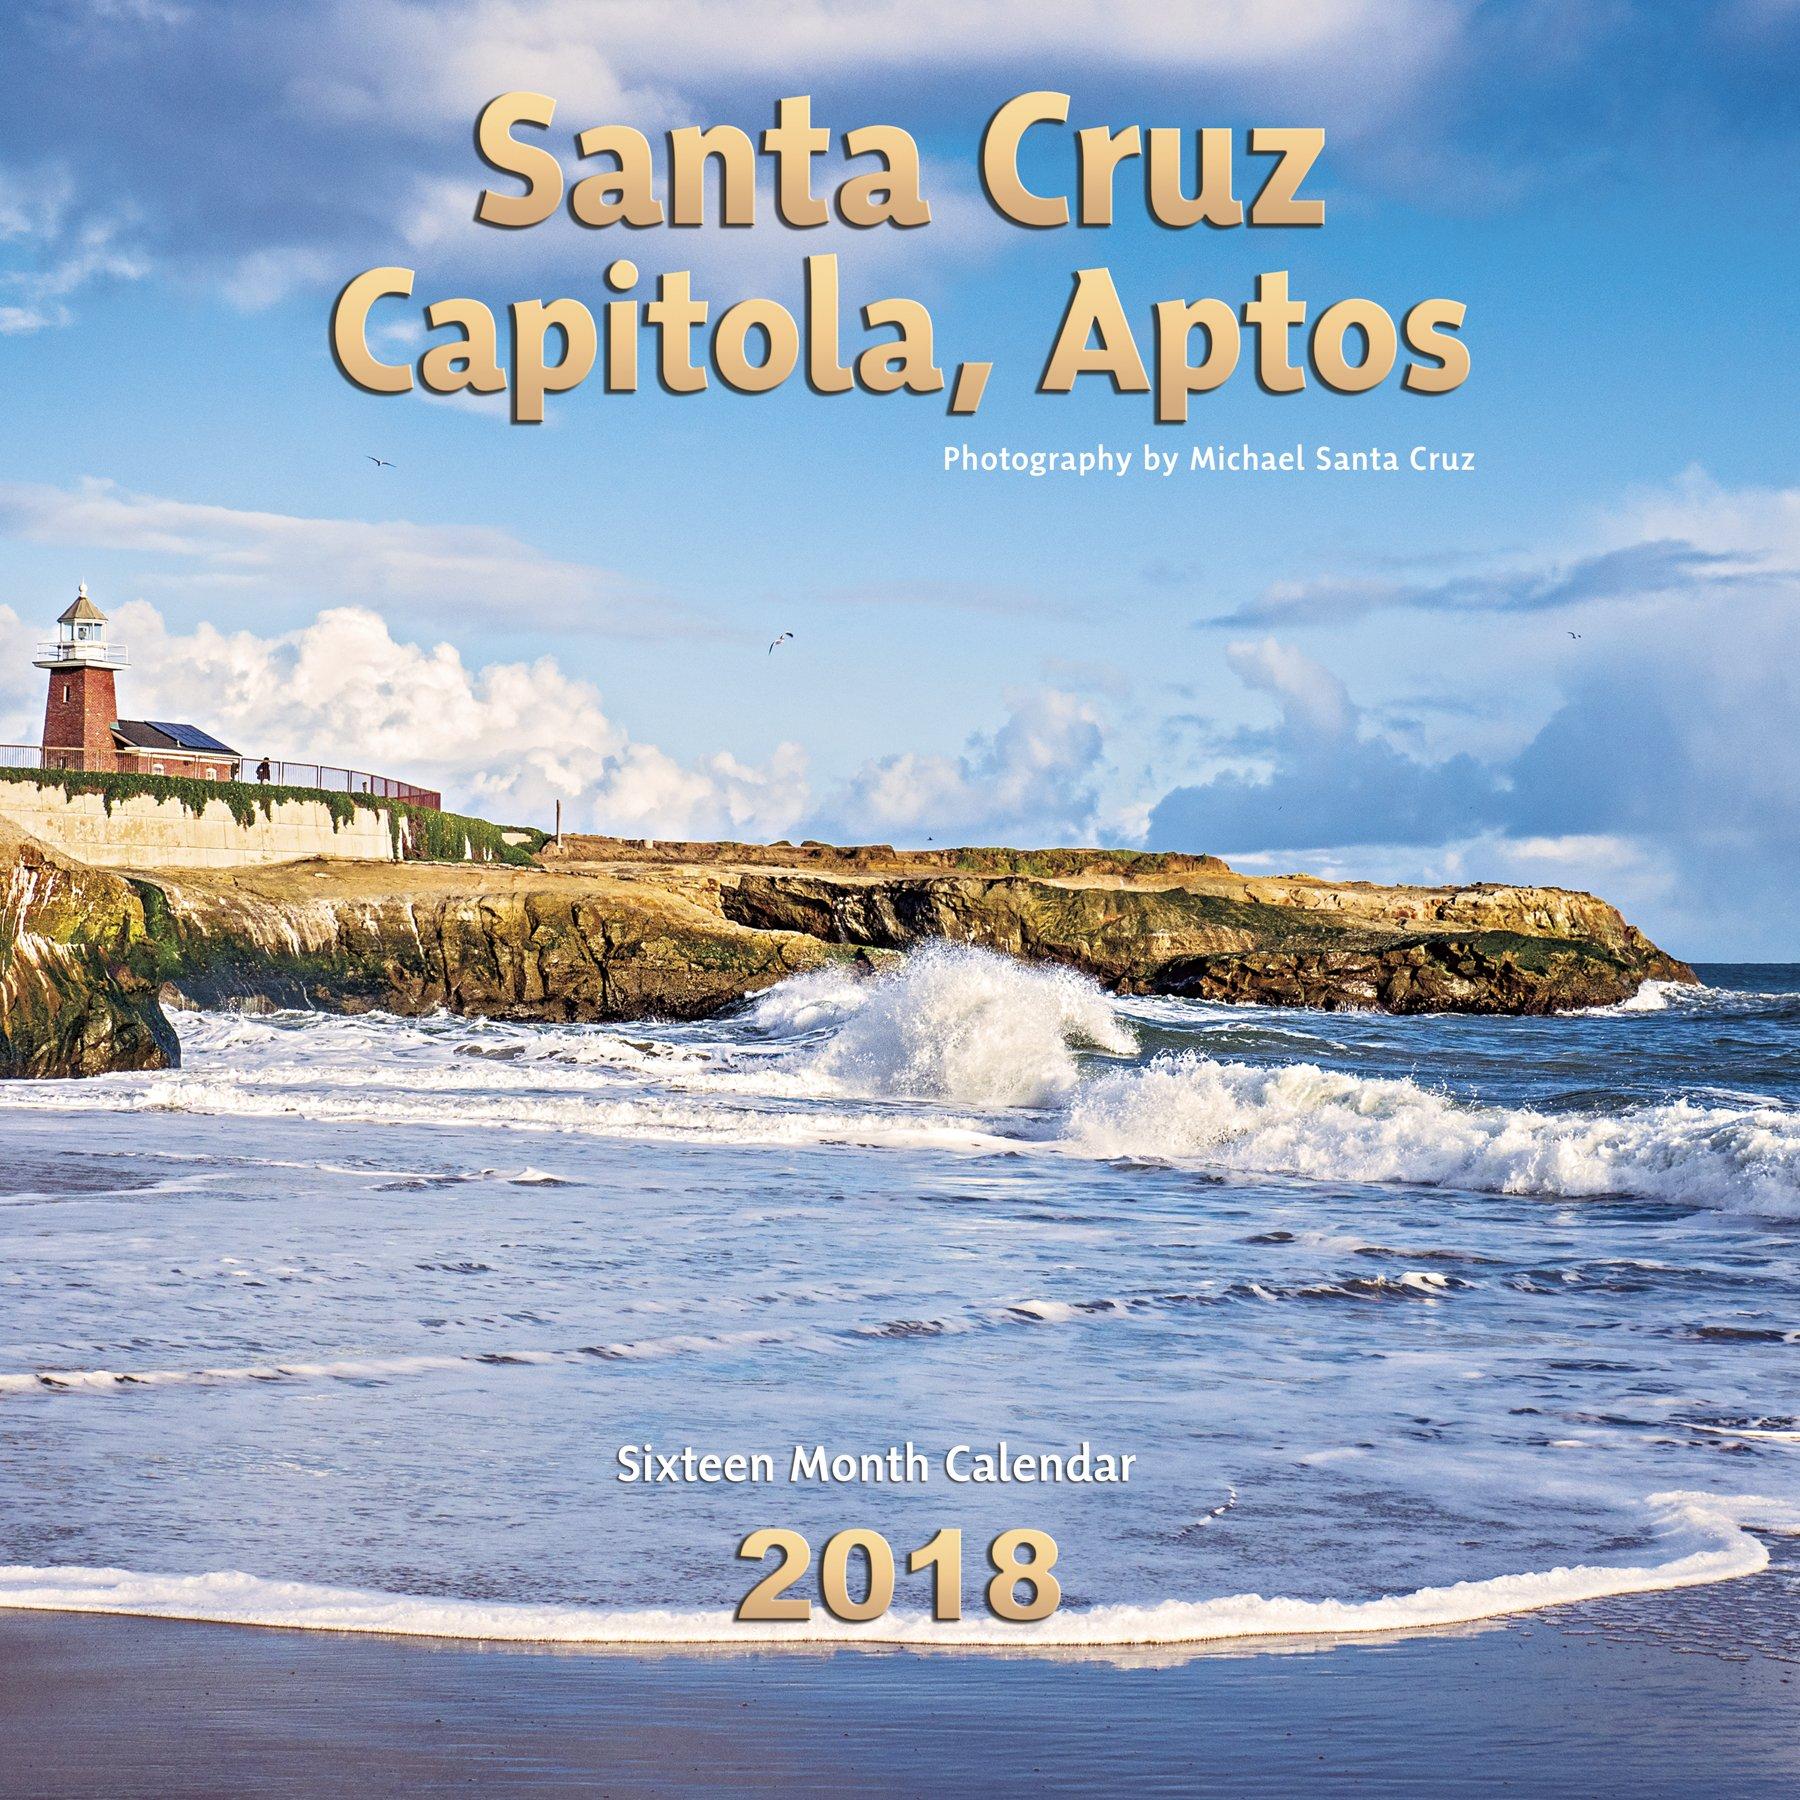 Santa cruz capitola aptos calendar 2018 michael santa cruz santa cruz capitola aptos calendar 2018 michael santa cruz 9781946599056 amazon books nvjuhfo Choice Image